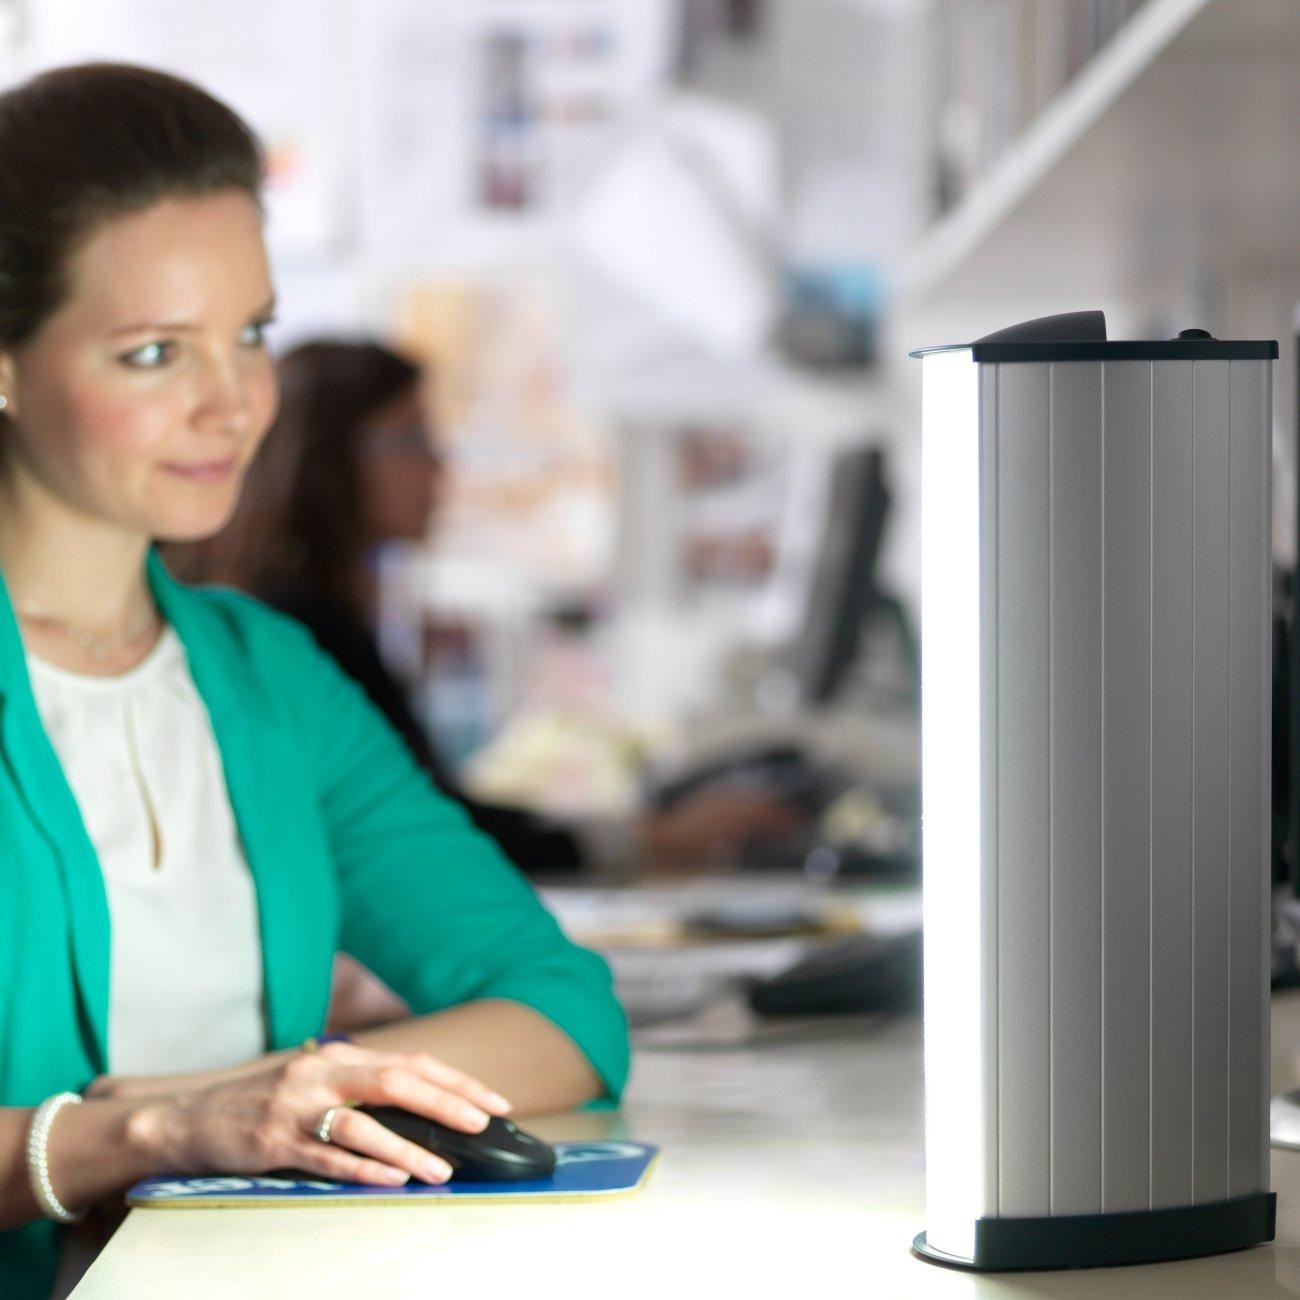 Lumie Brightspark   SAD Lightbox For SAD Light Therapy At Your Desk:  Amazon.co.uk: Health U0026 Personal Care